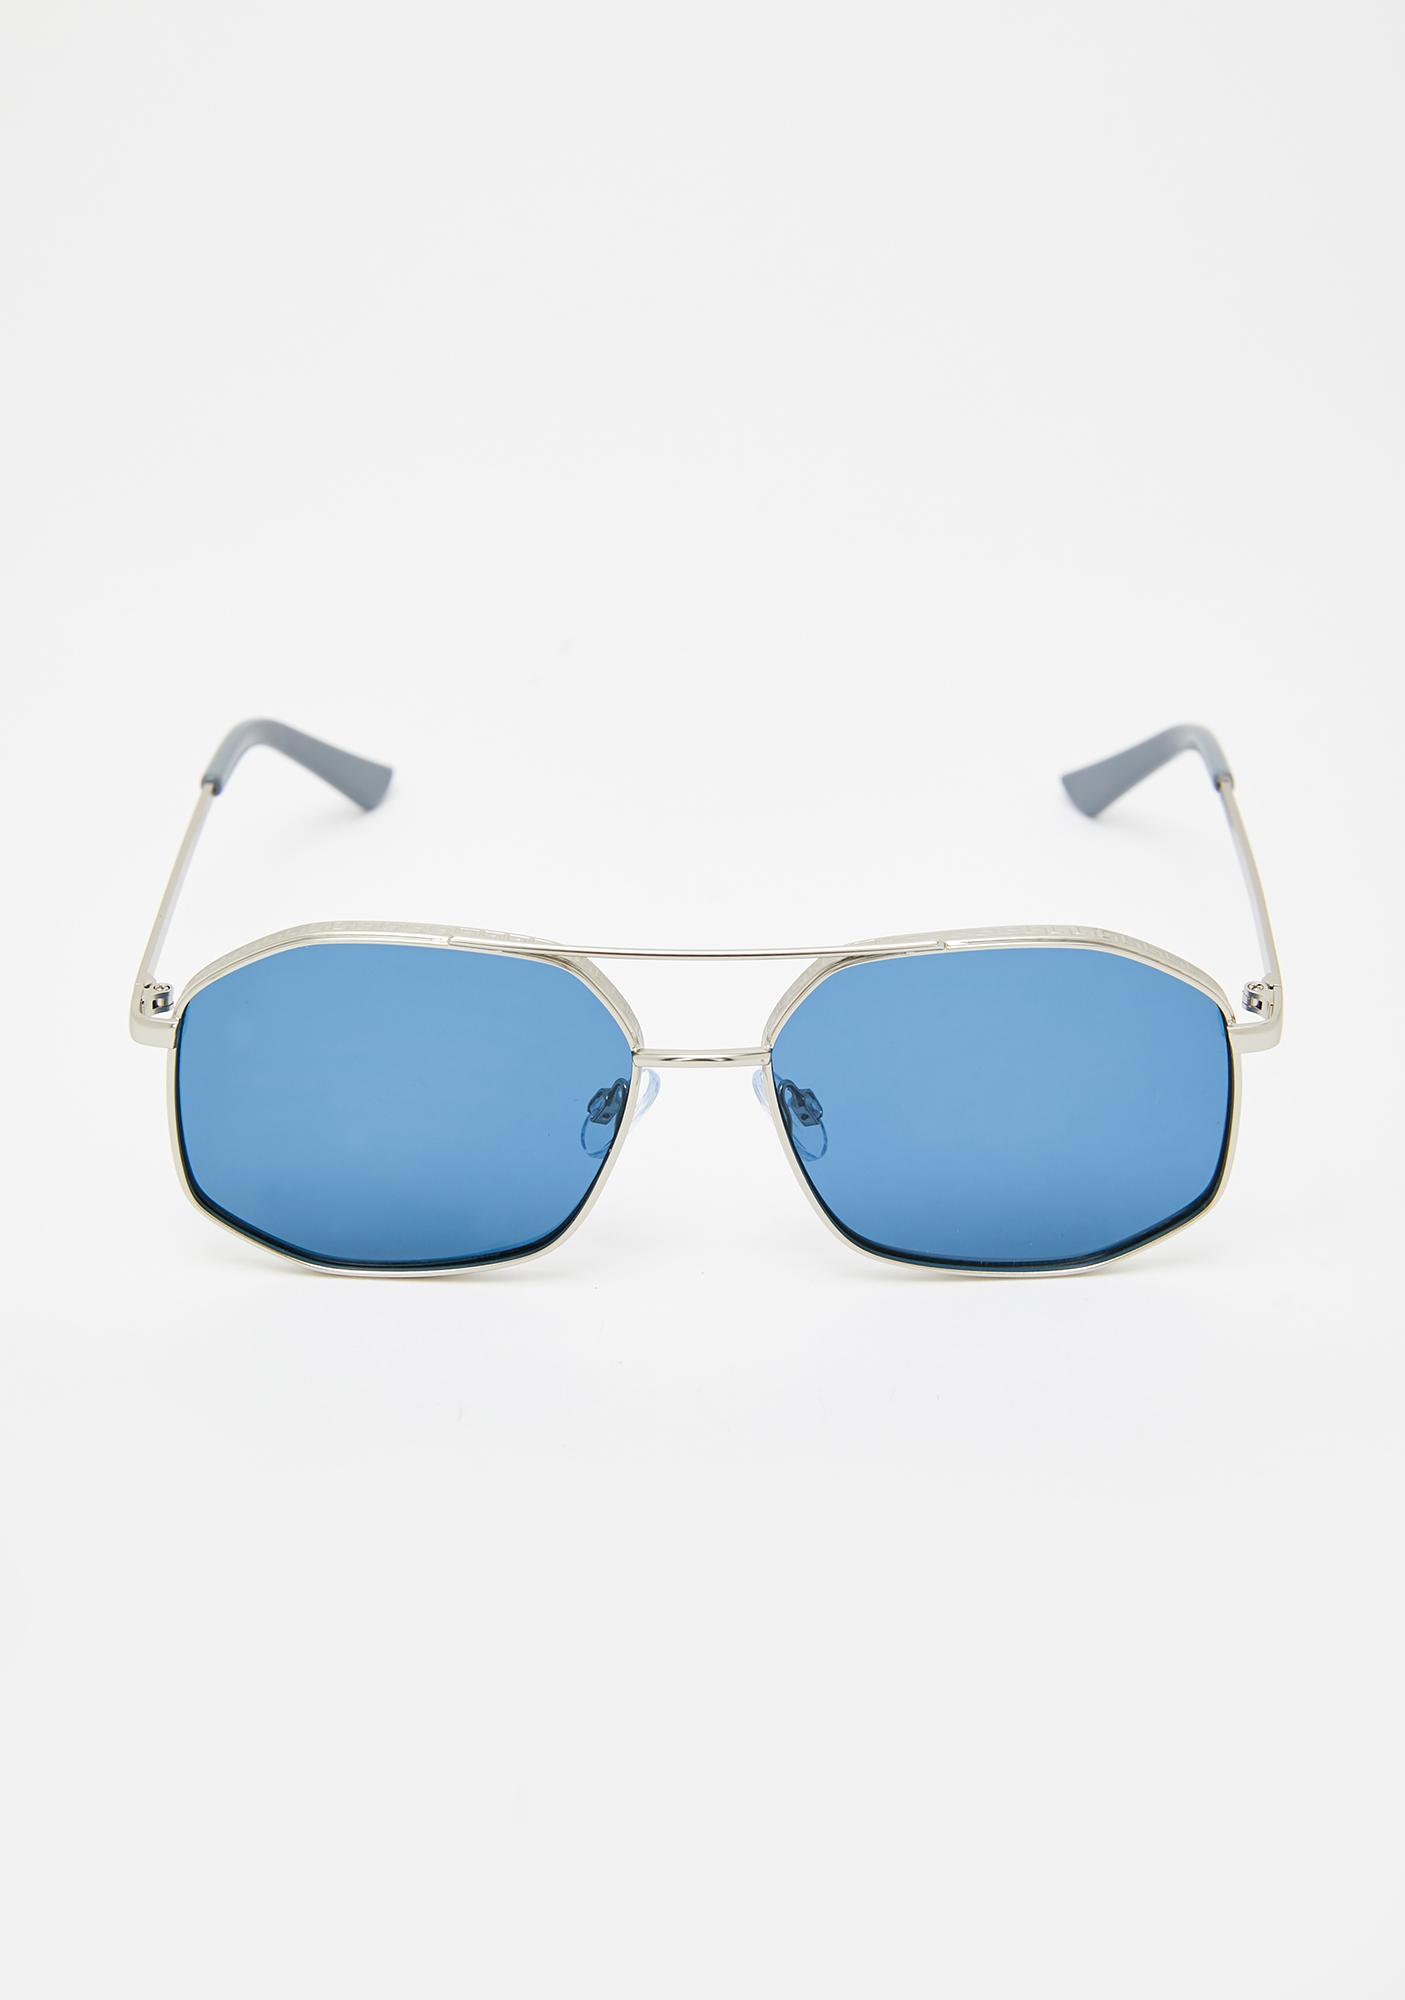 Turbo Mode Aviator Sunglasses